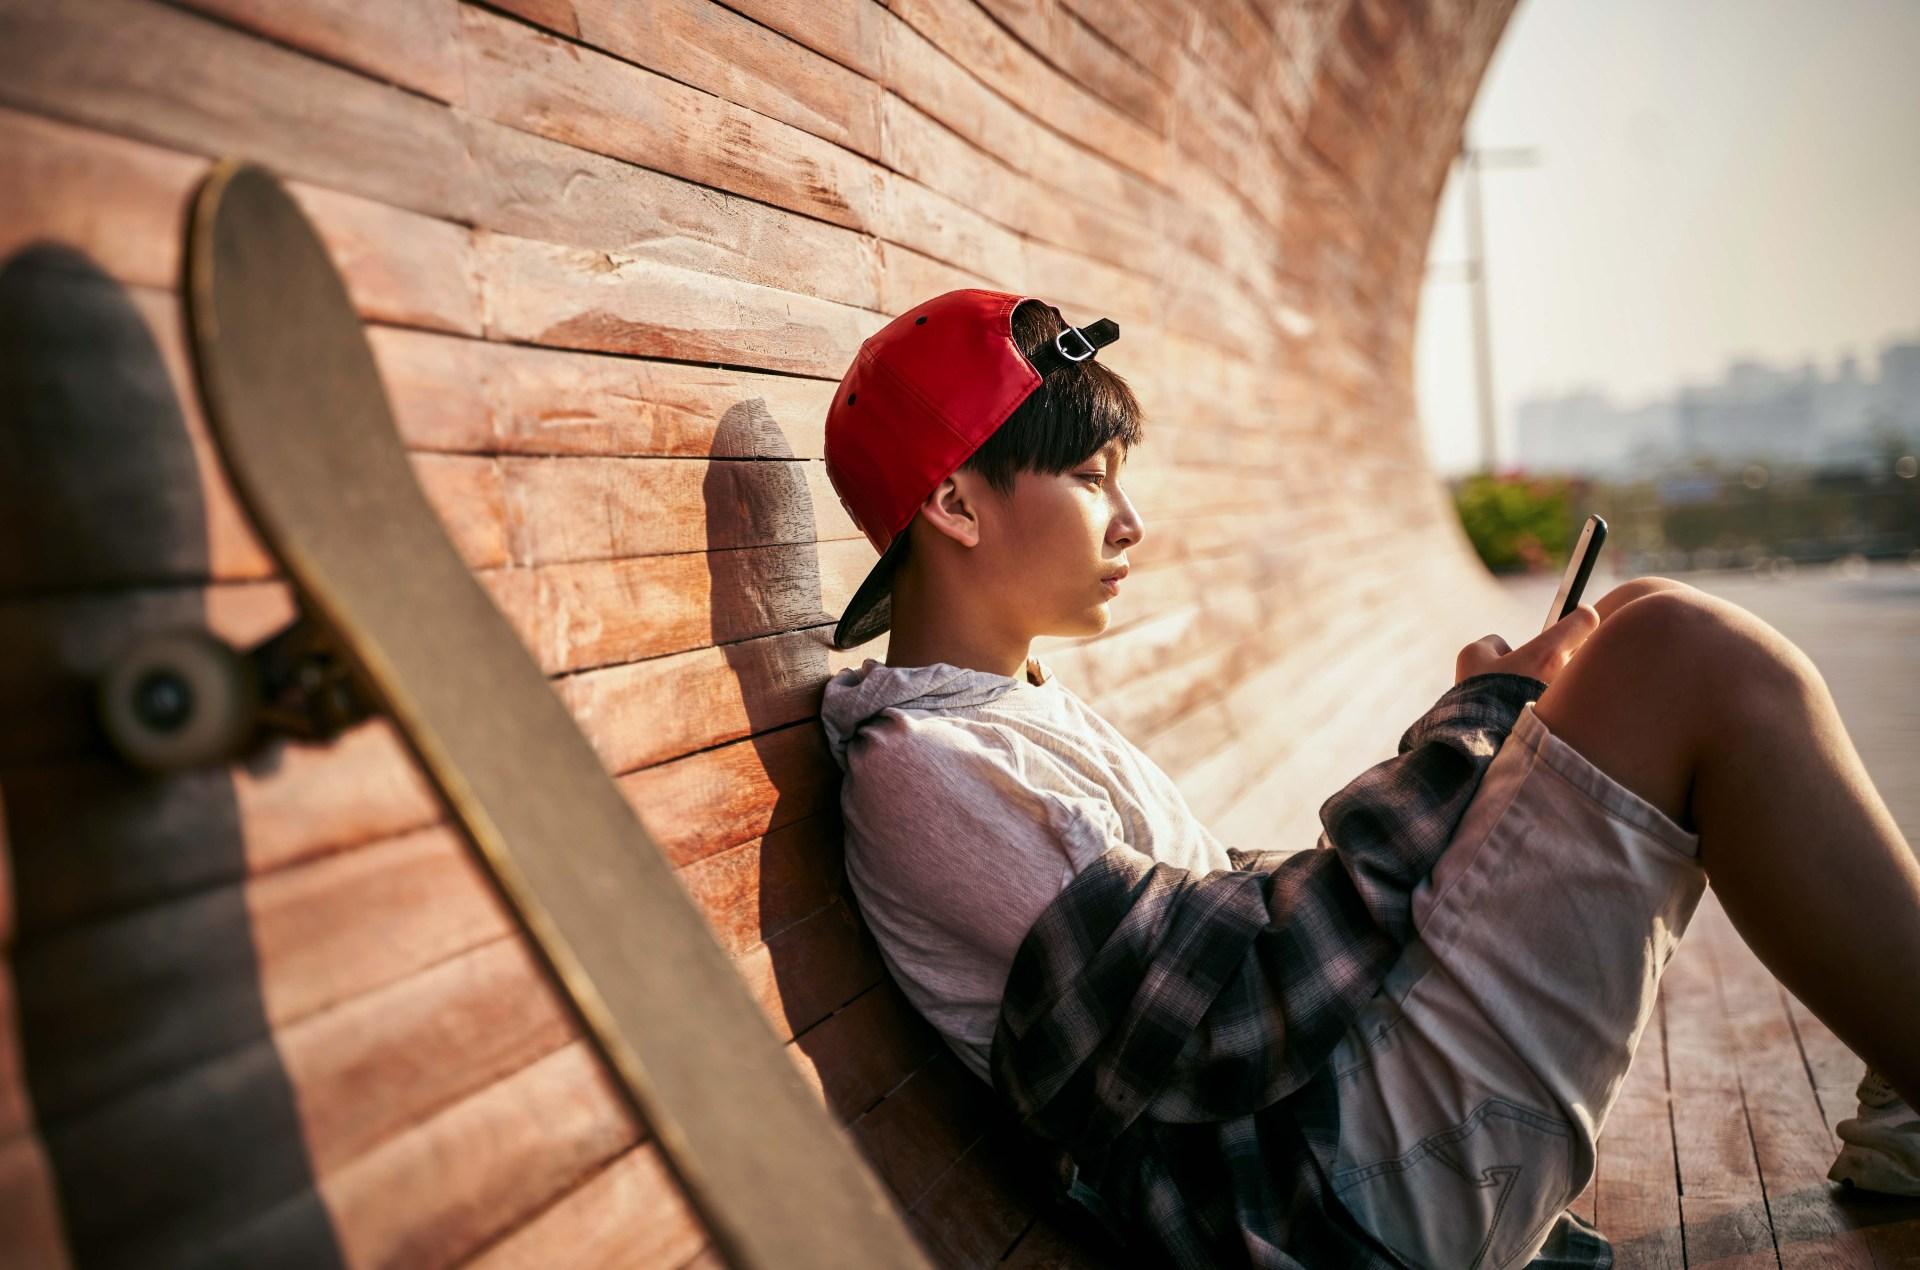 teen boy with skateboard on phone